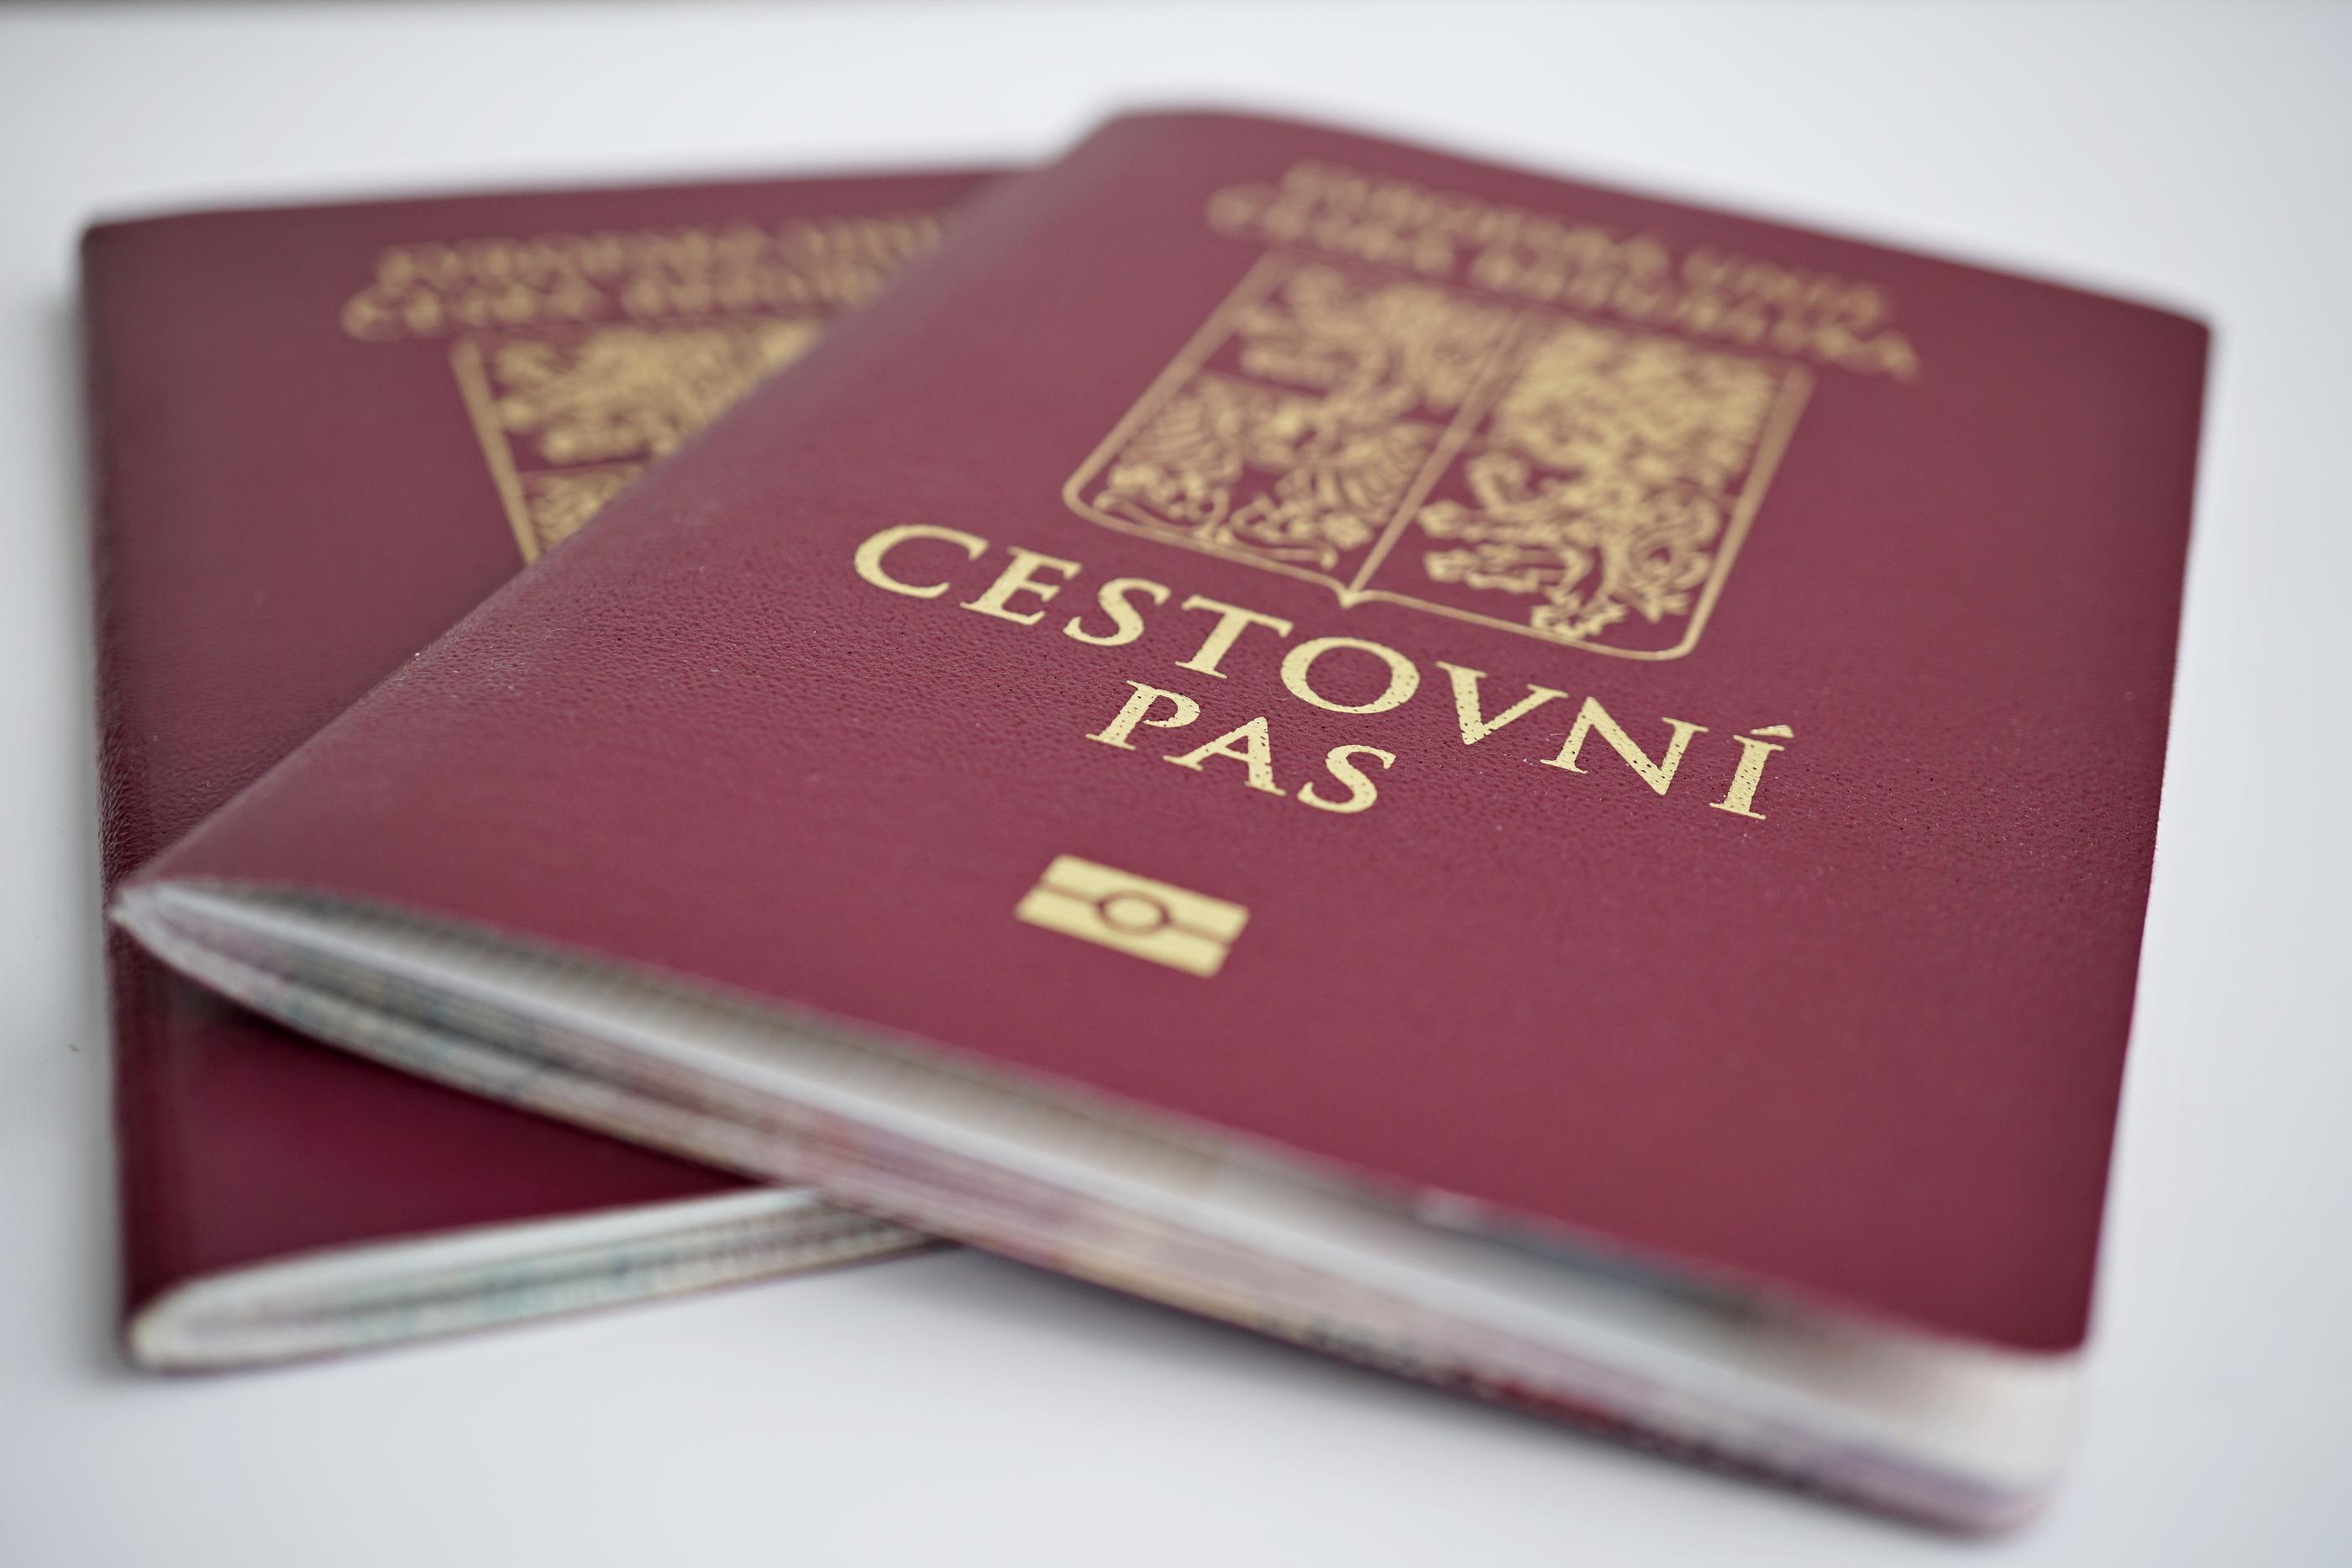 Passport Photo Requirements - OnTheGoSoft]